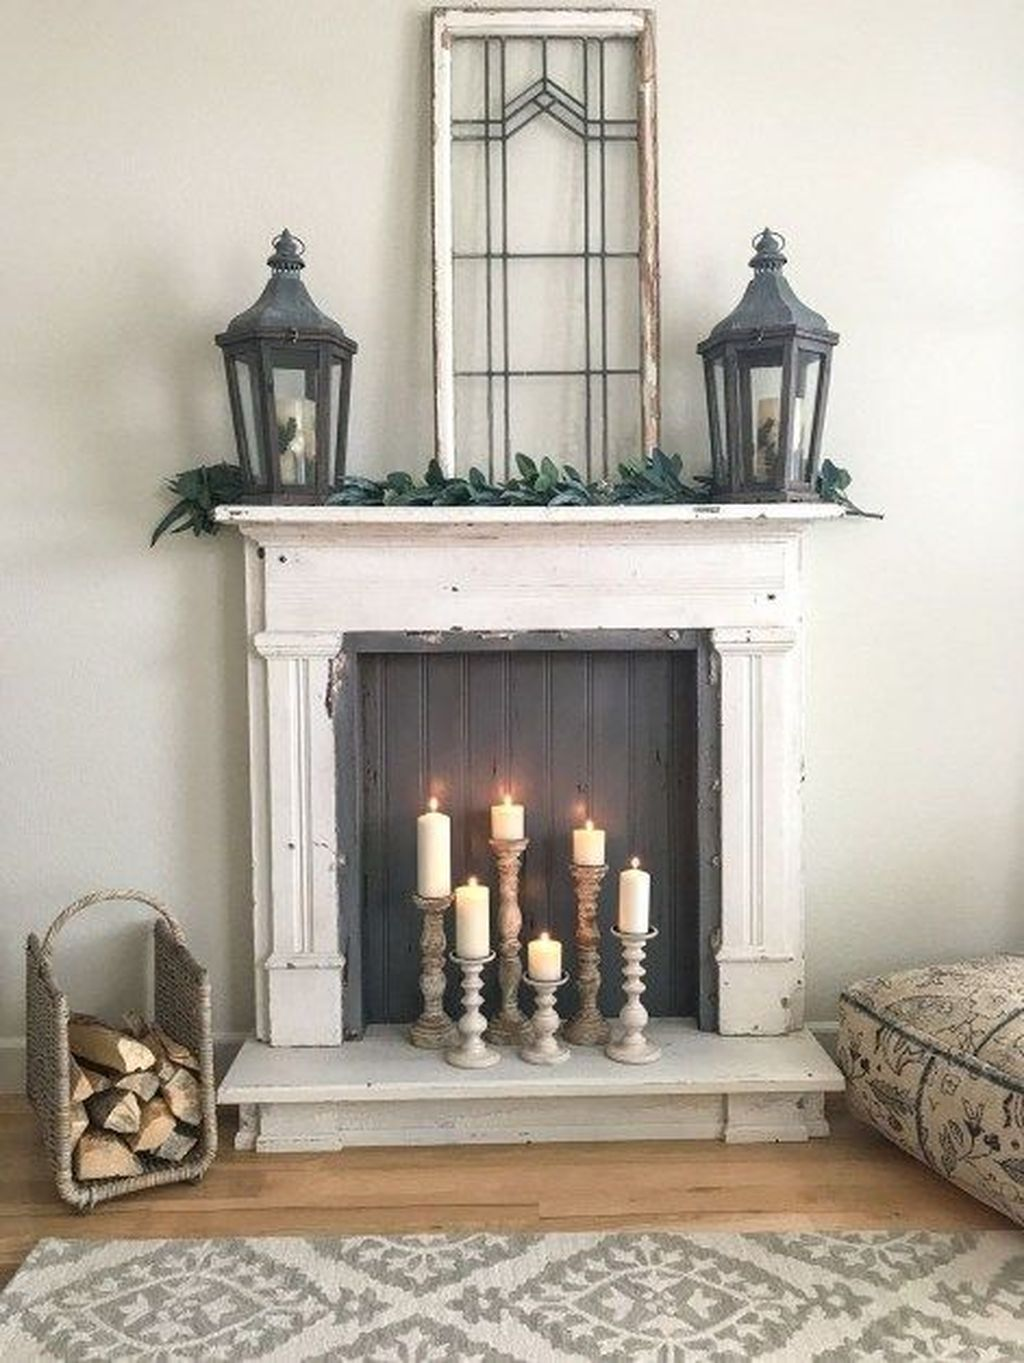 Nice Fireplace Decor Ideas Best For Wintertime 25 - PIMPHOMEE